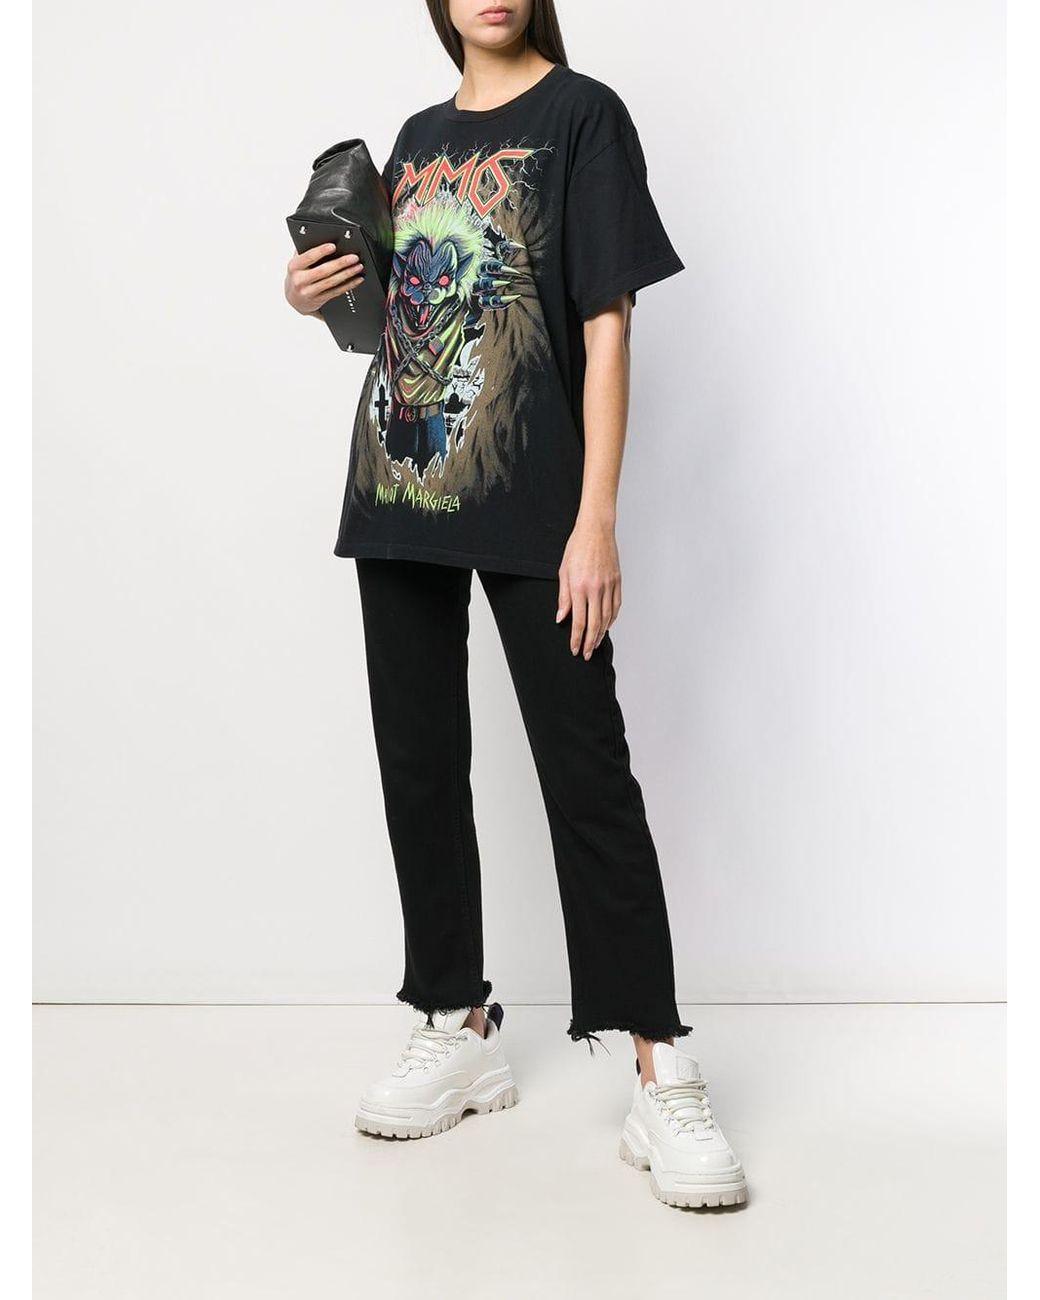 9ef3b615 MM6 by Maison Martin Margiela Zombie Cat Print T-shirt in Black - Save 60%  - Lyst